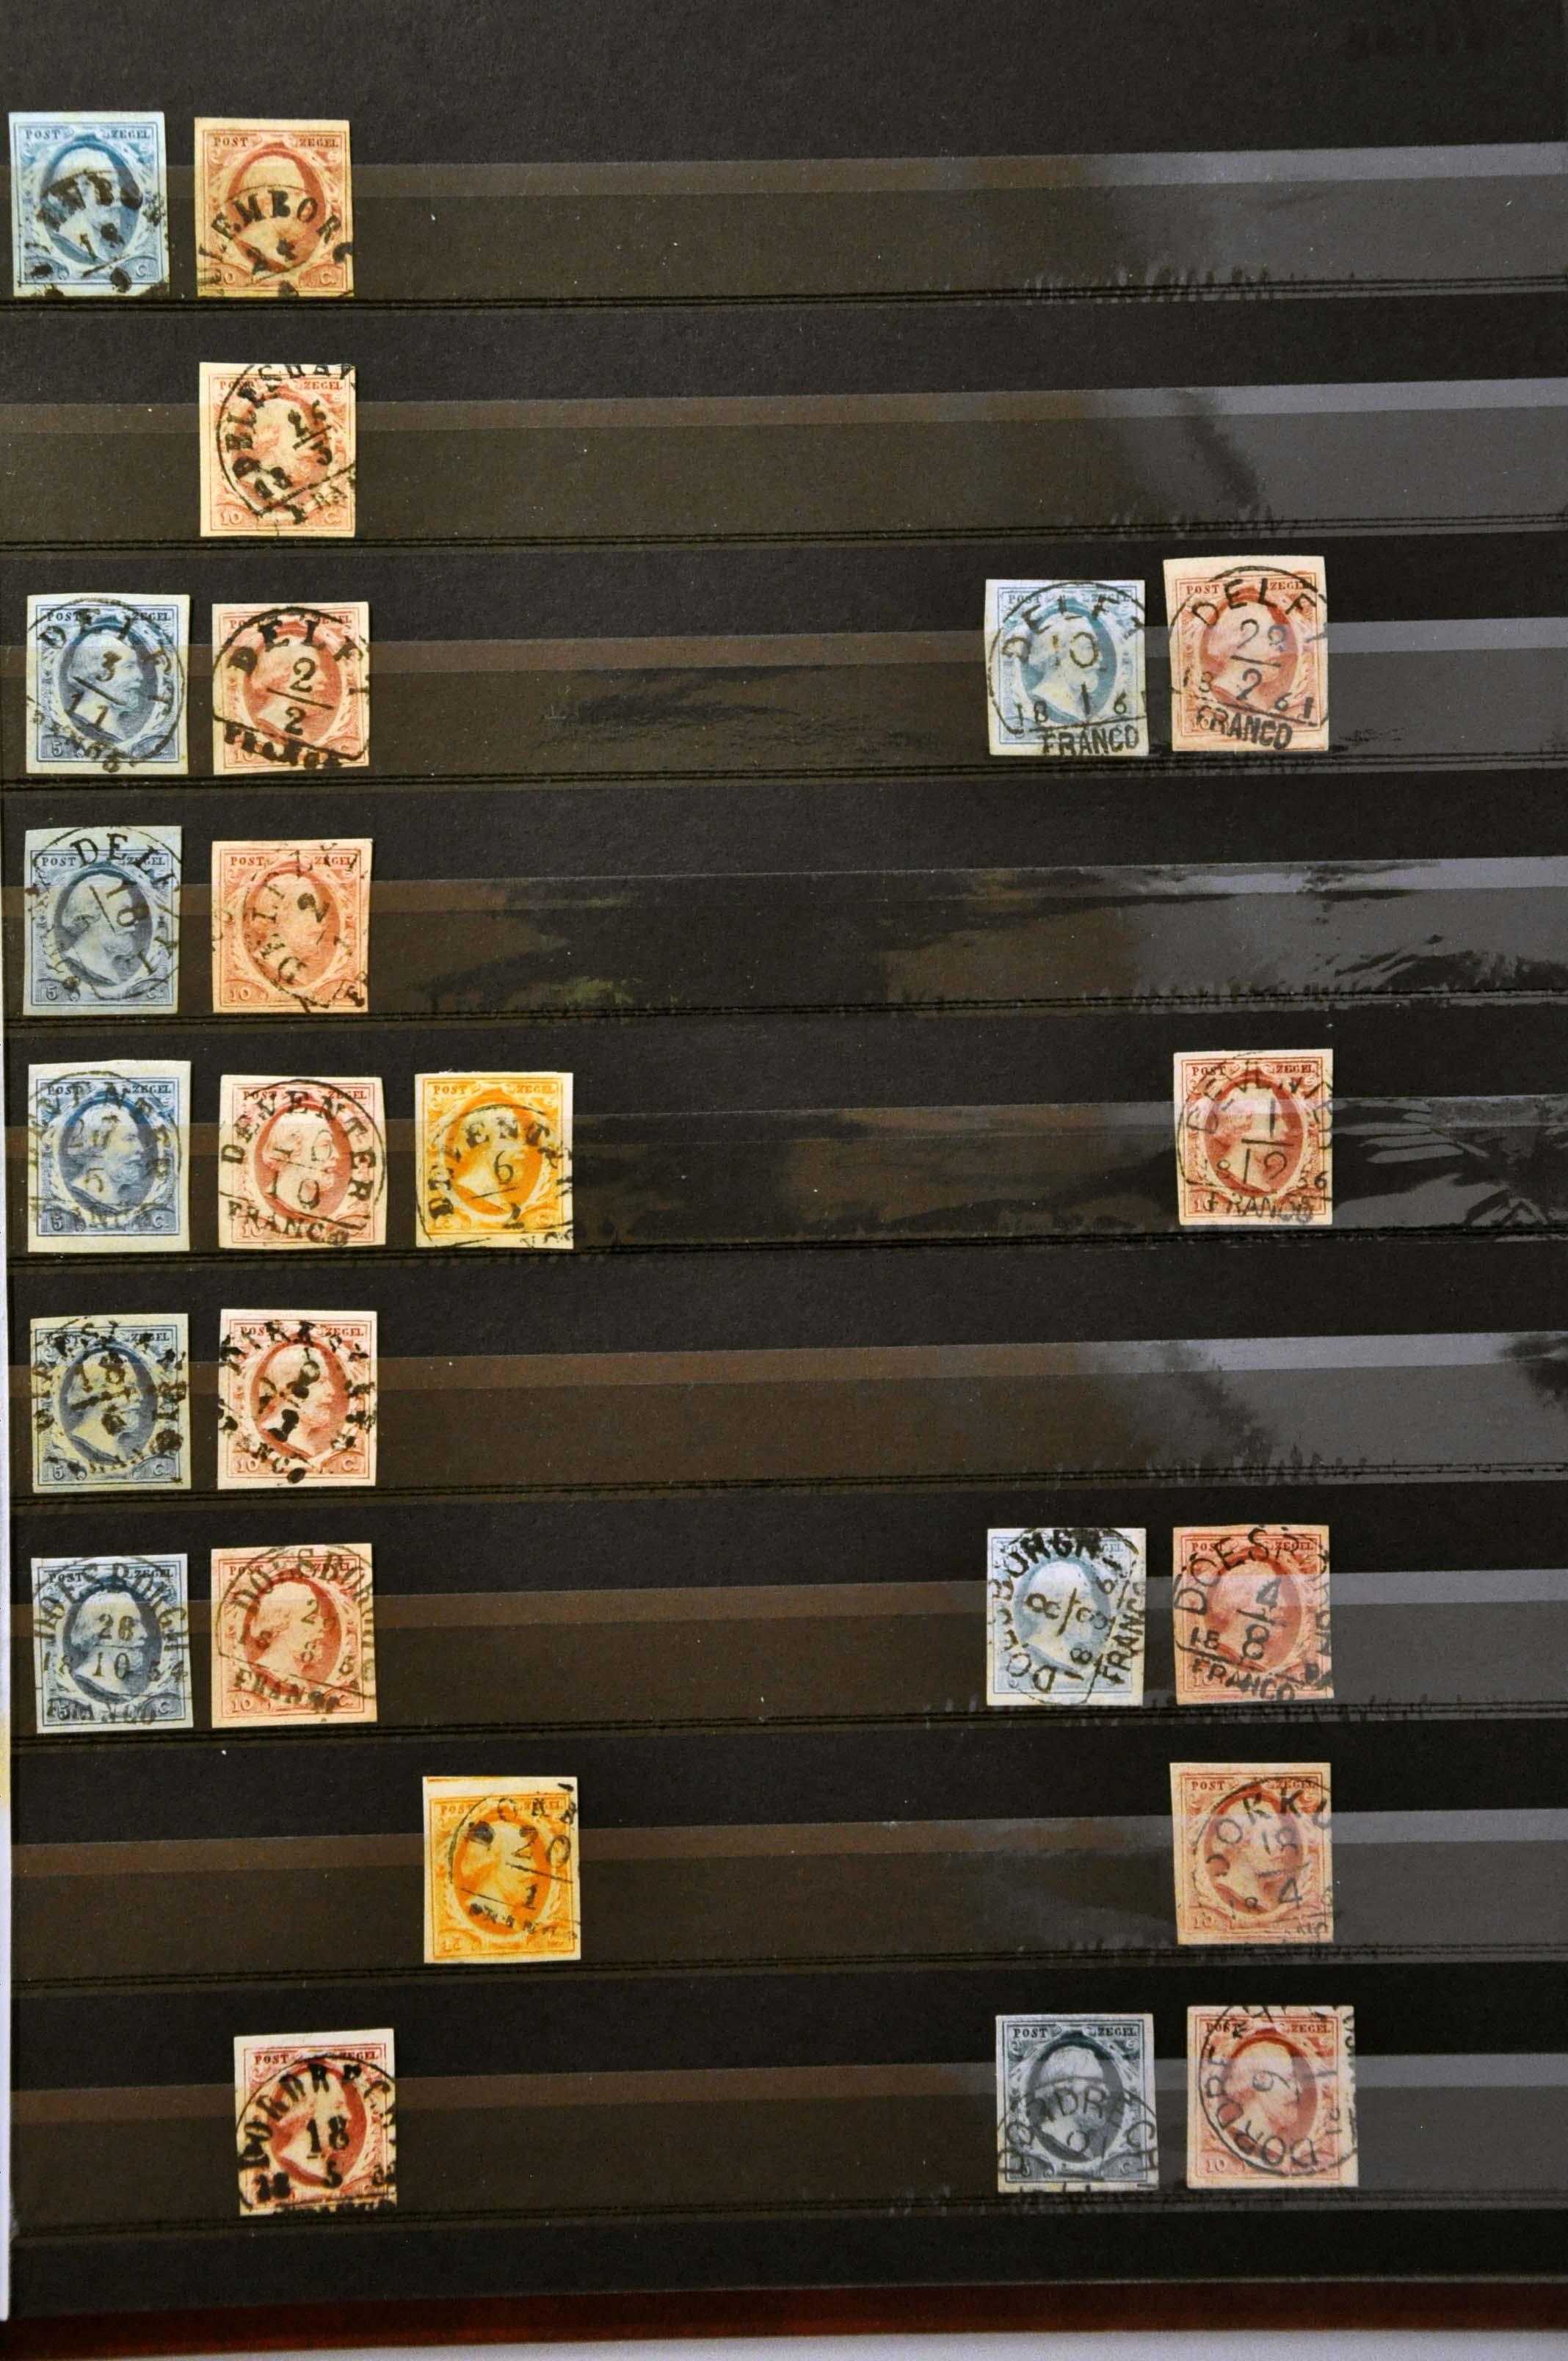 Lot 1450 - Netherlands and former colonies Netherlands -  Corinphila Veilingen Auction 239: General sale